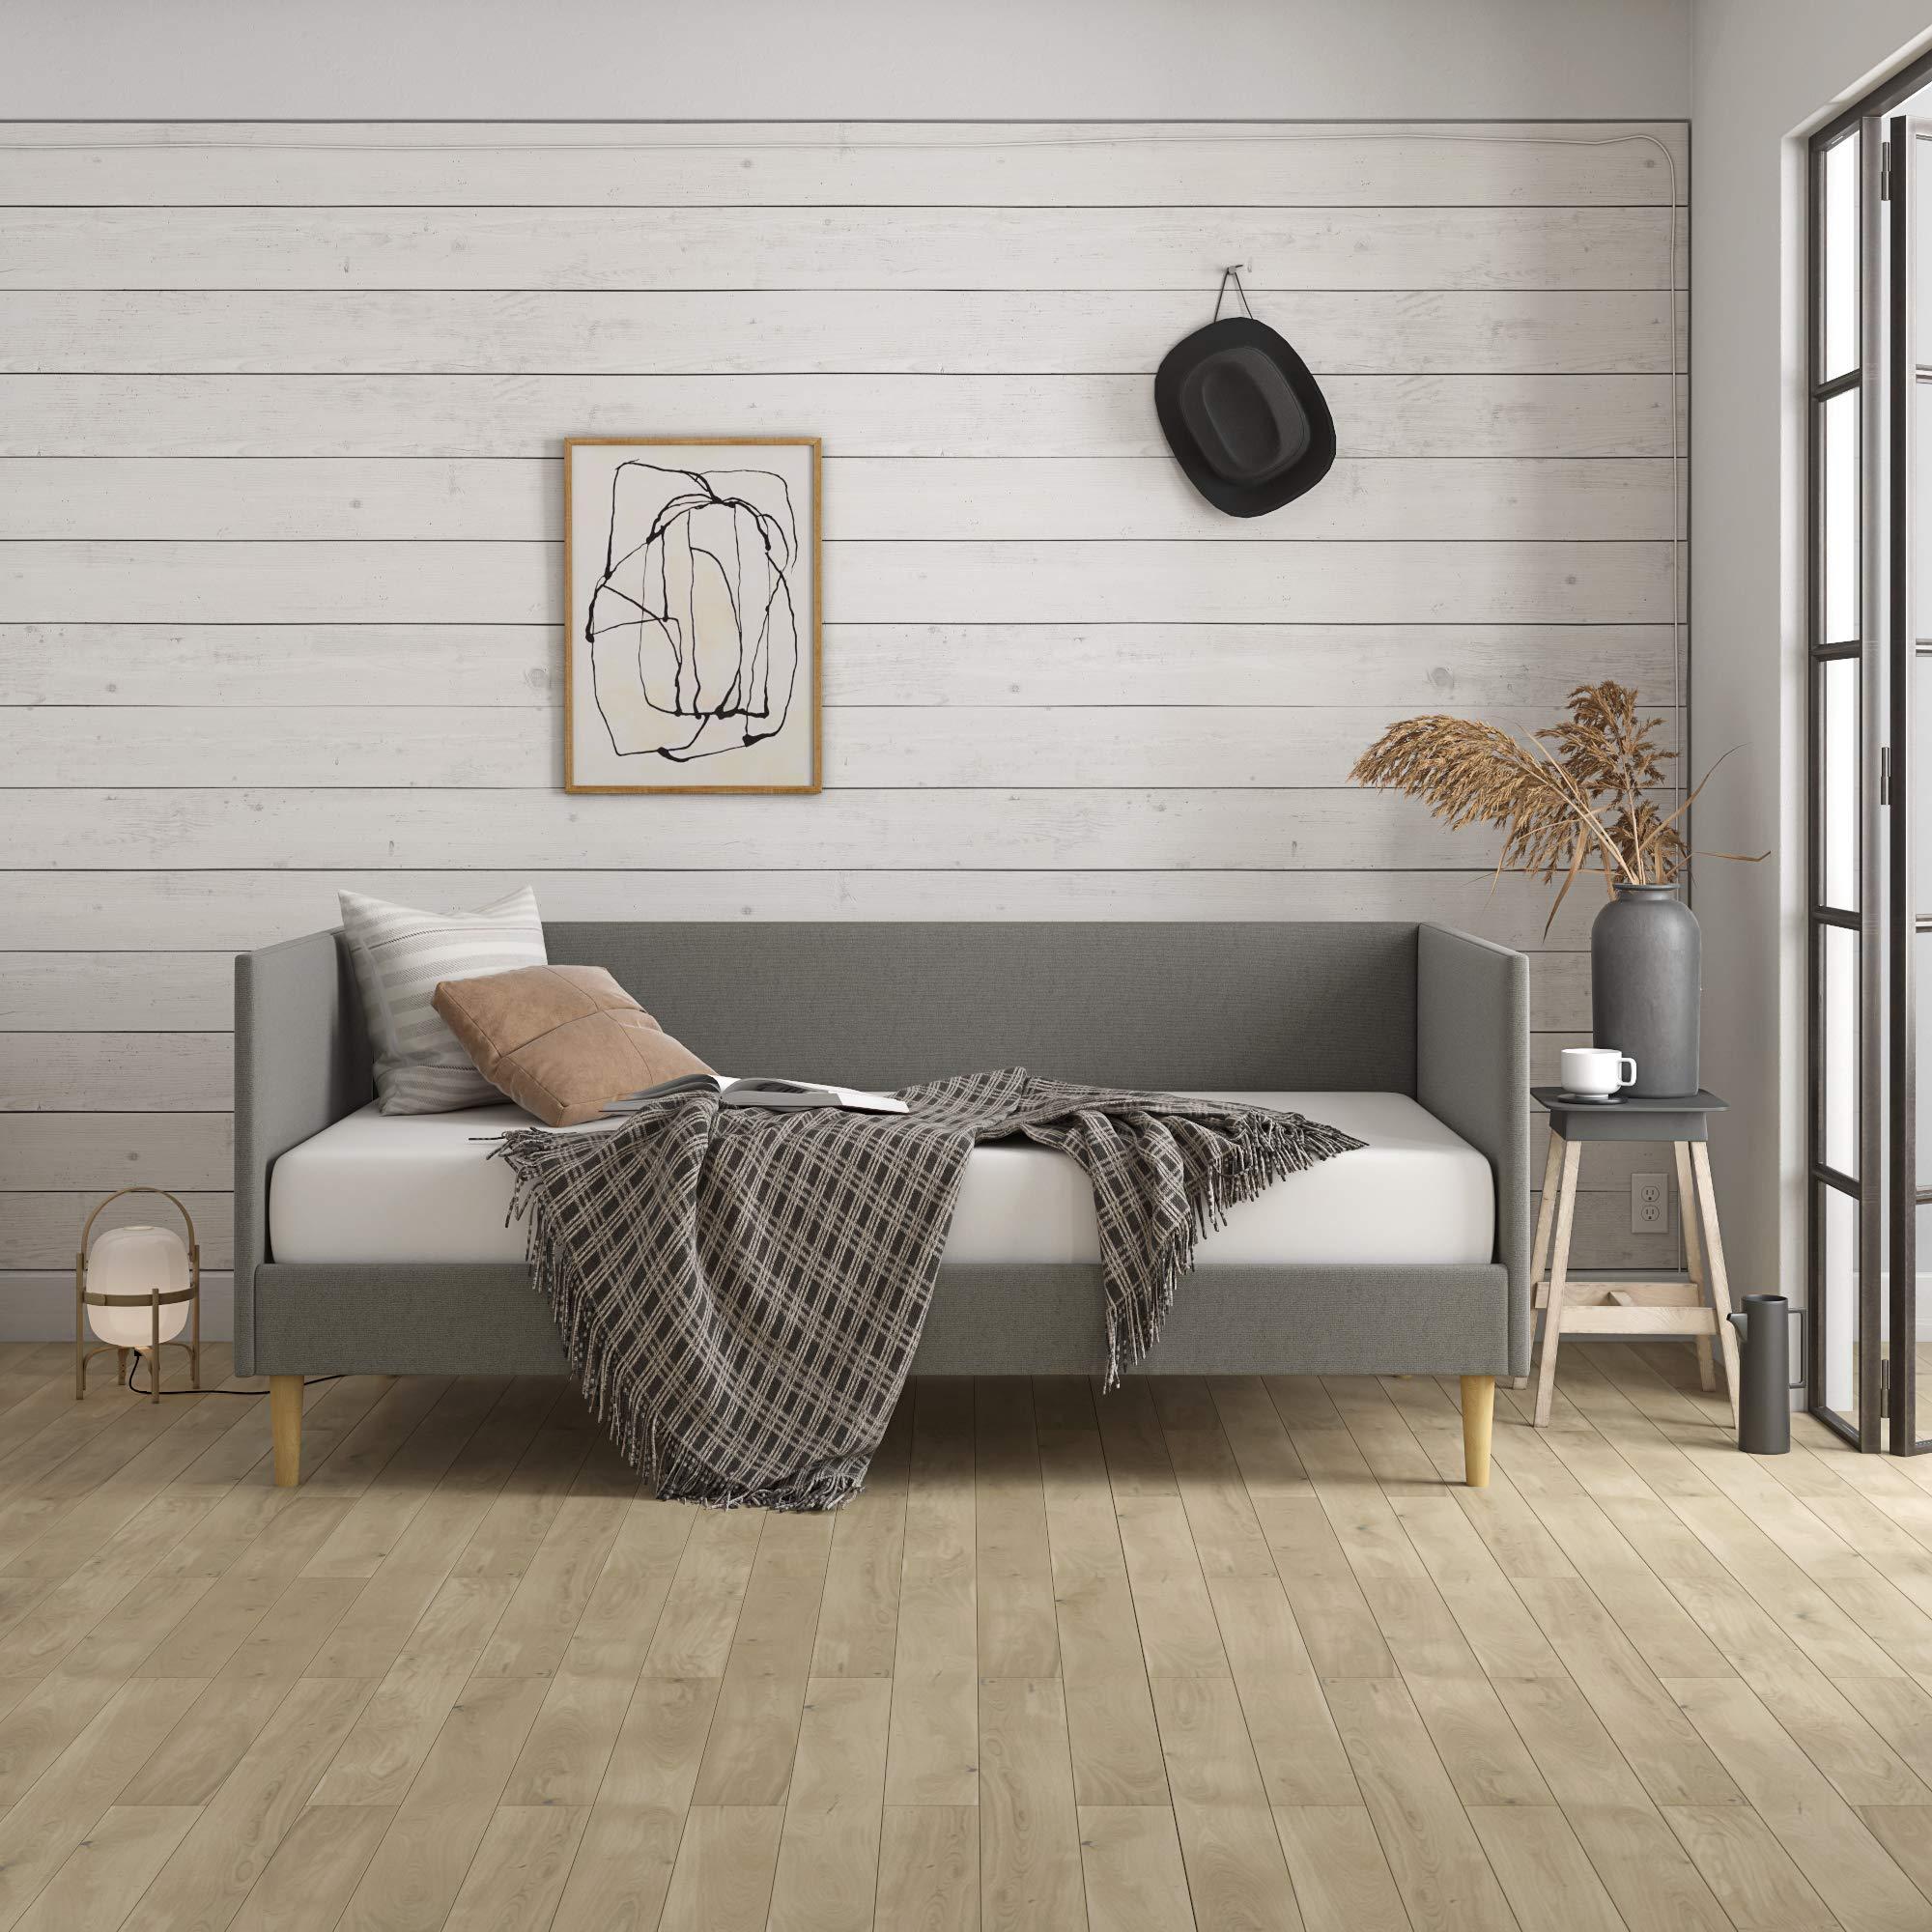 minimalist furniture amazon comdhp franklin mid century daybed, mid century modern design, rich grey linen upholstery